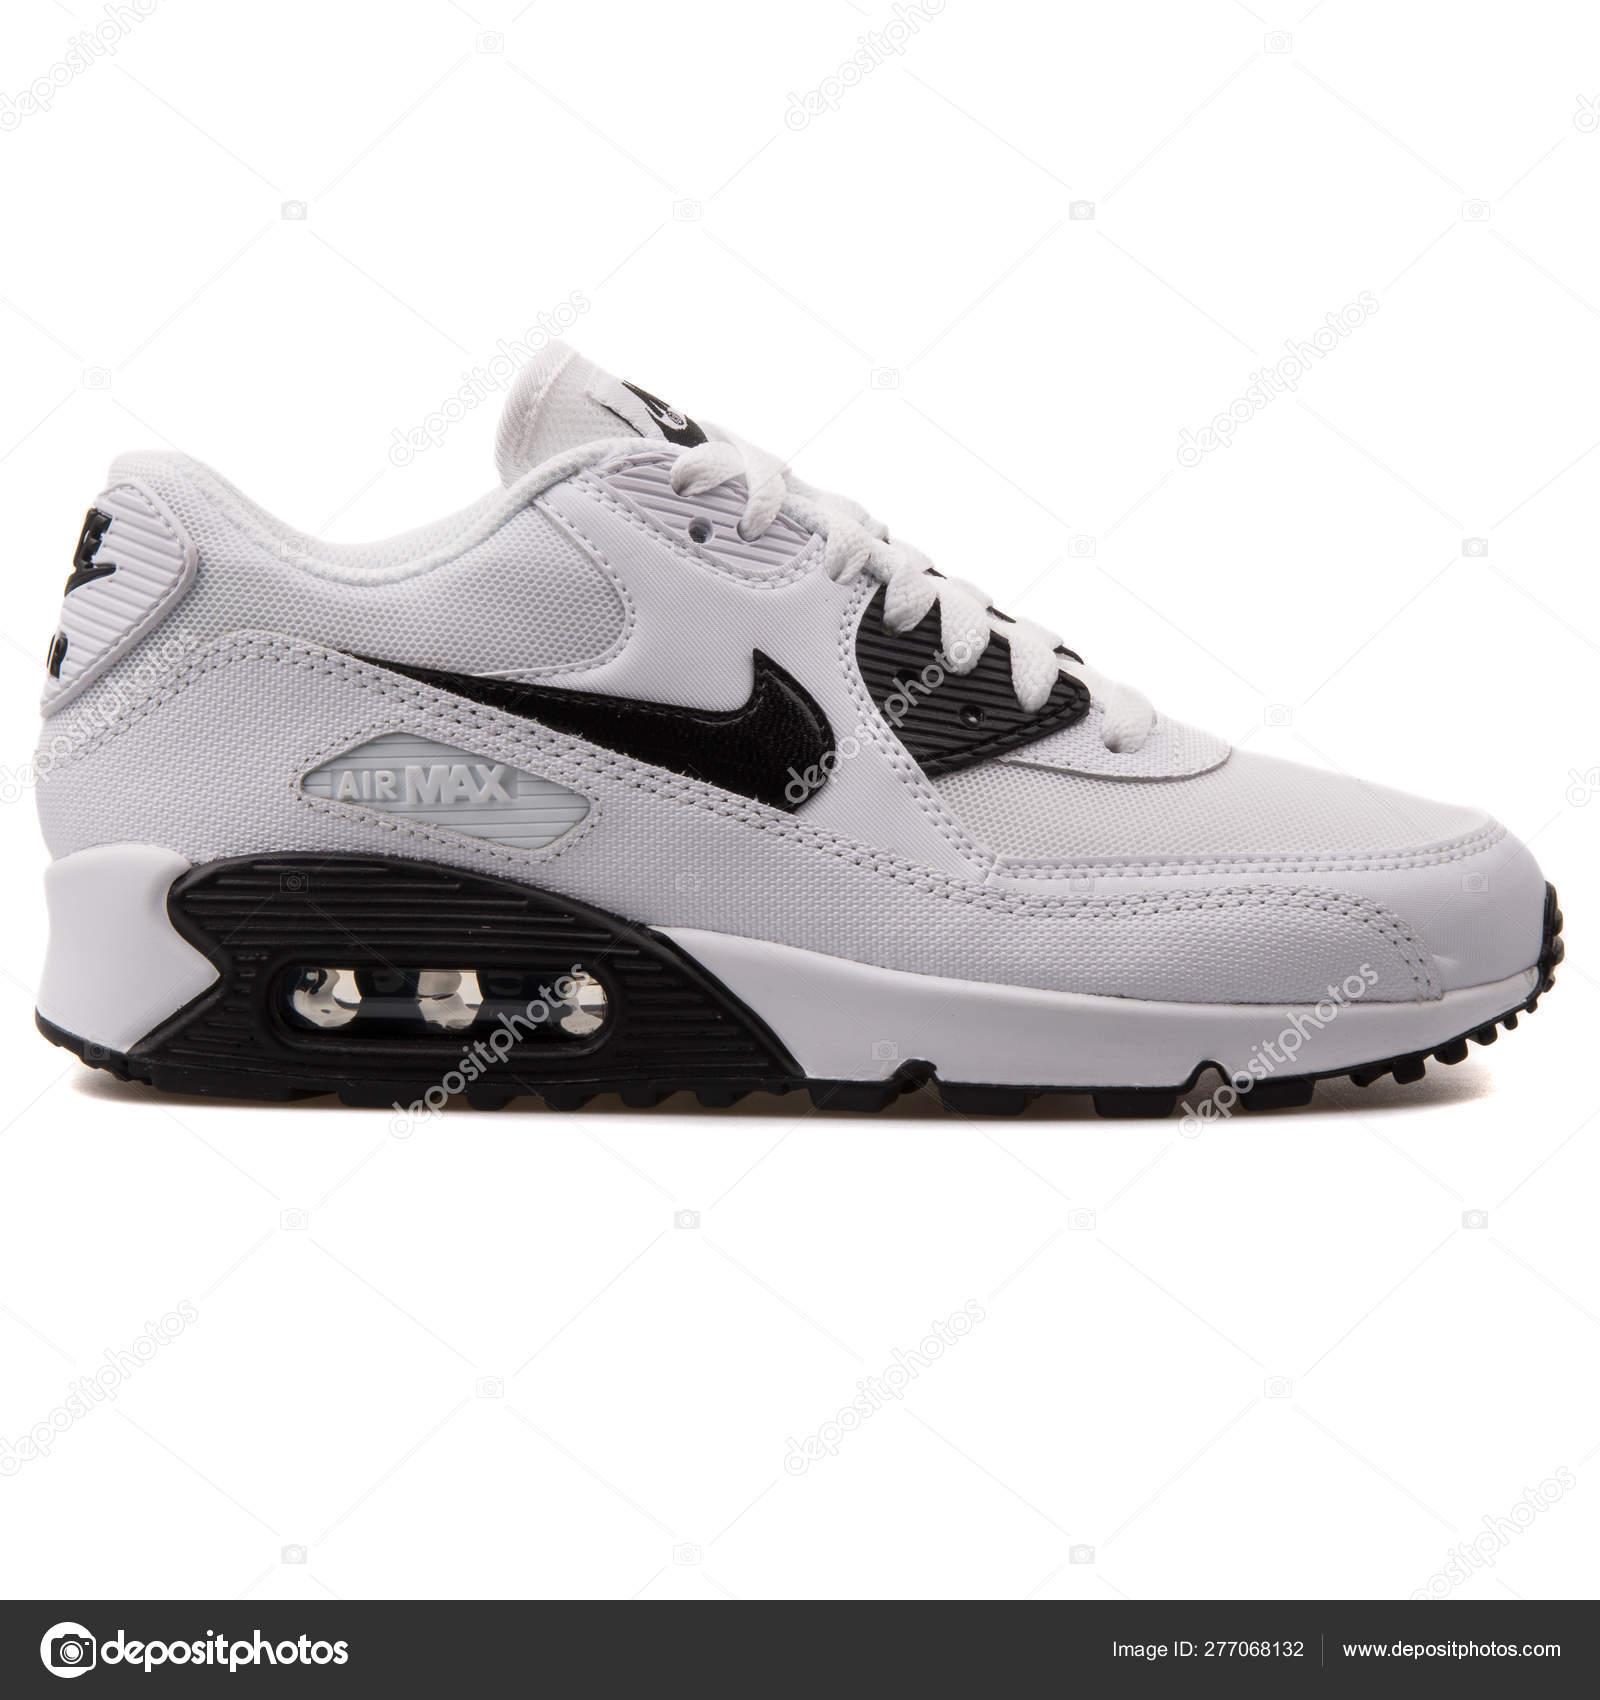 ZAPATOS ES MODA | Zapatos Nike Air Max 90 Essential Negras